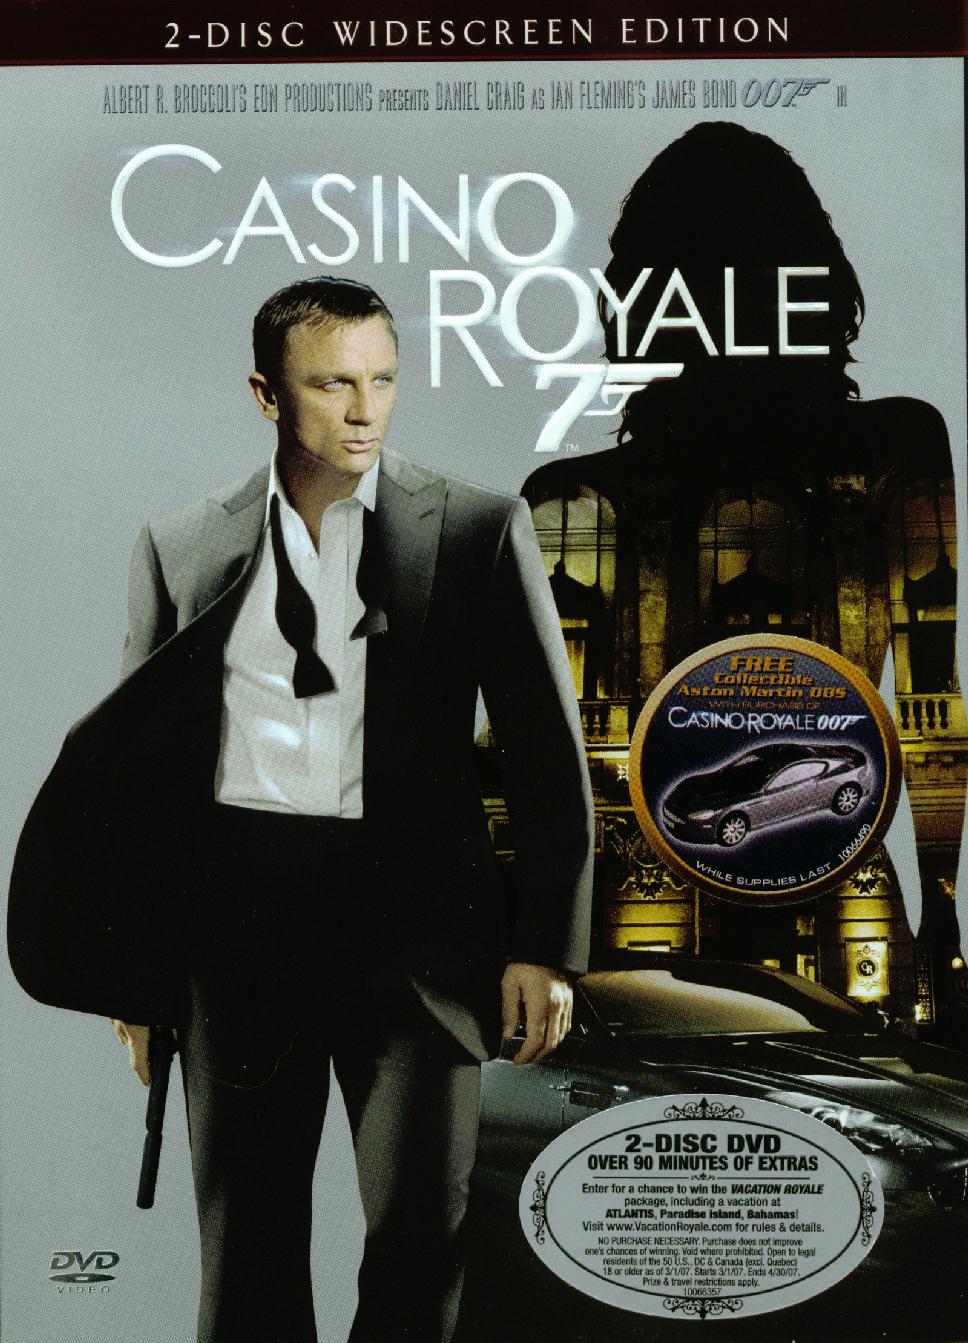 Rip casino royal pools gambling